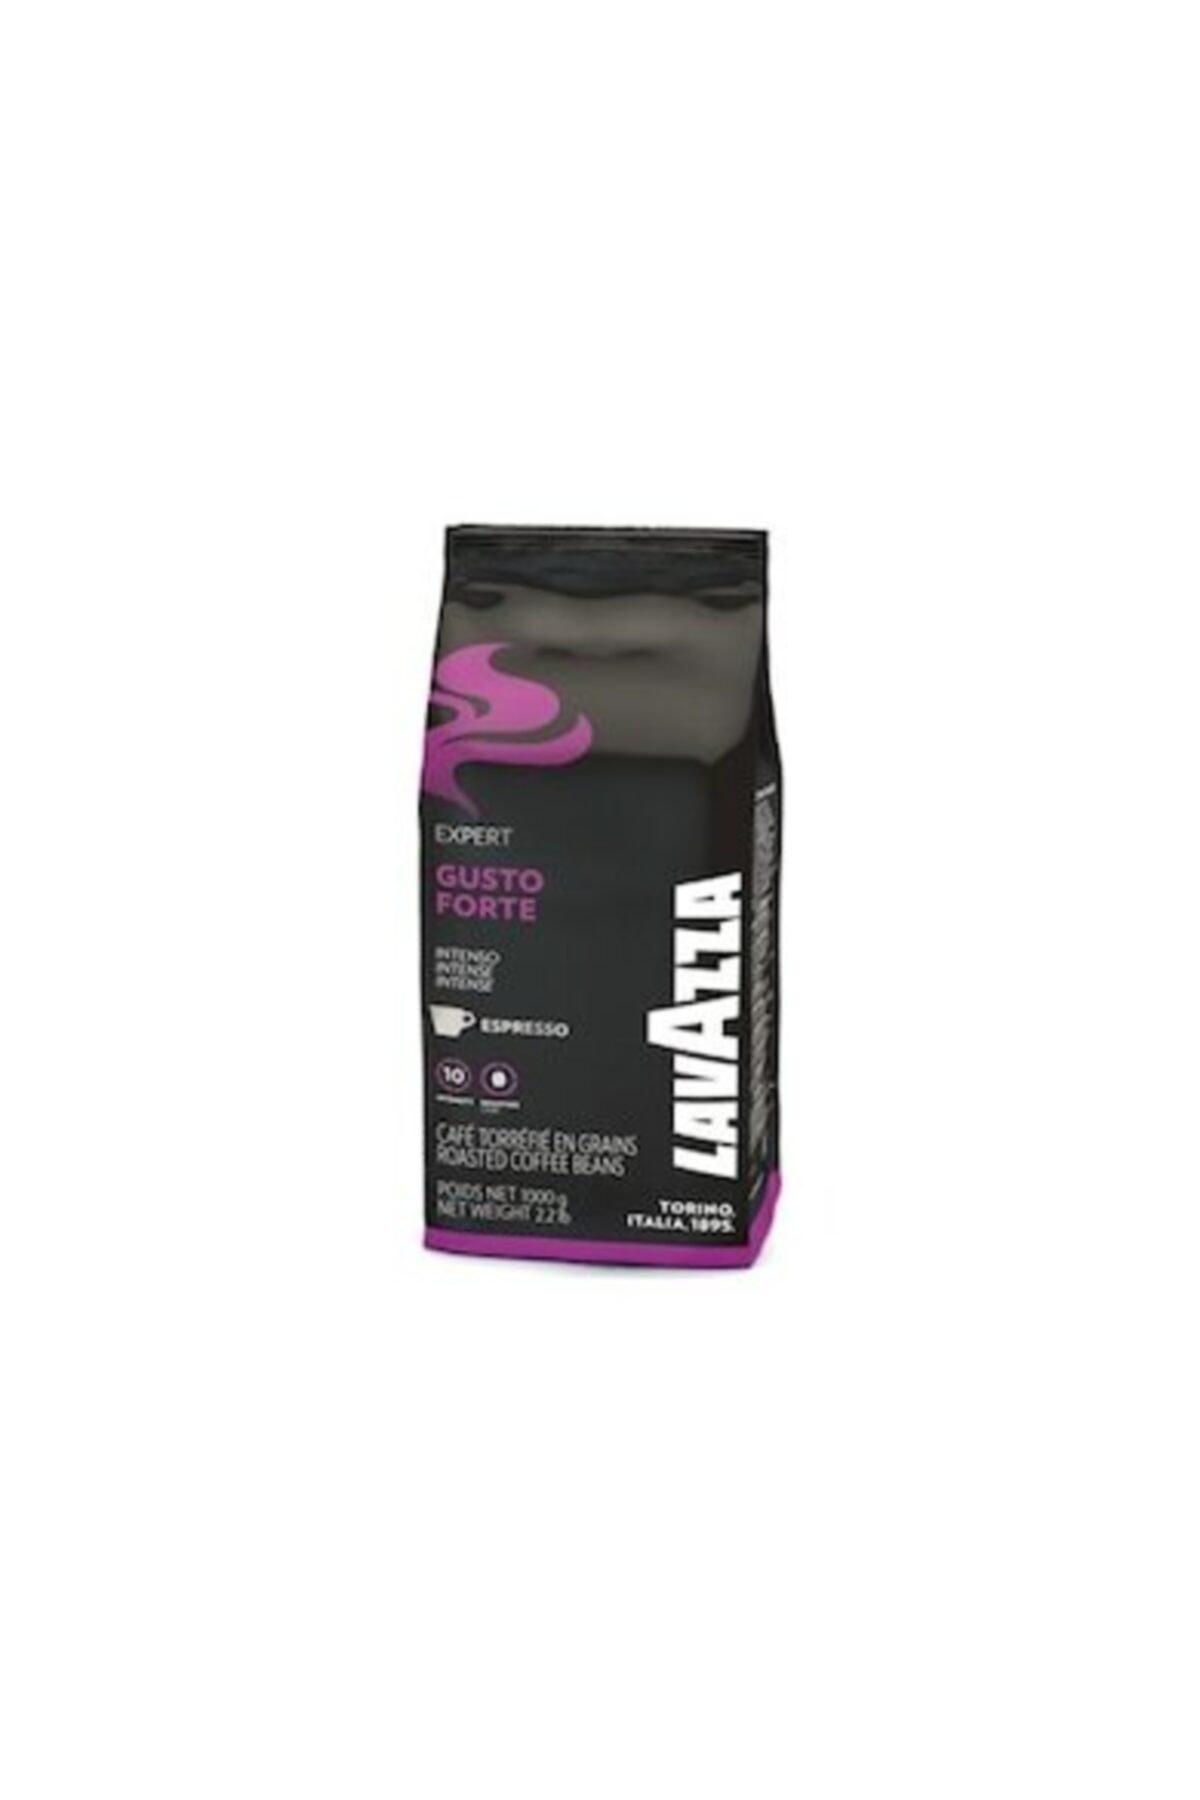 LavAzza Expert Gusto Forte Çekirdek Kahve 1 Kg 2